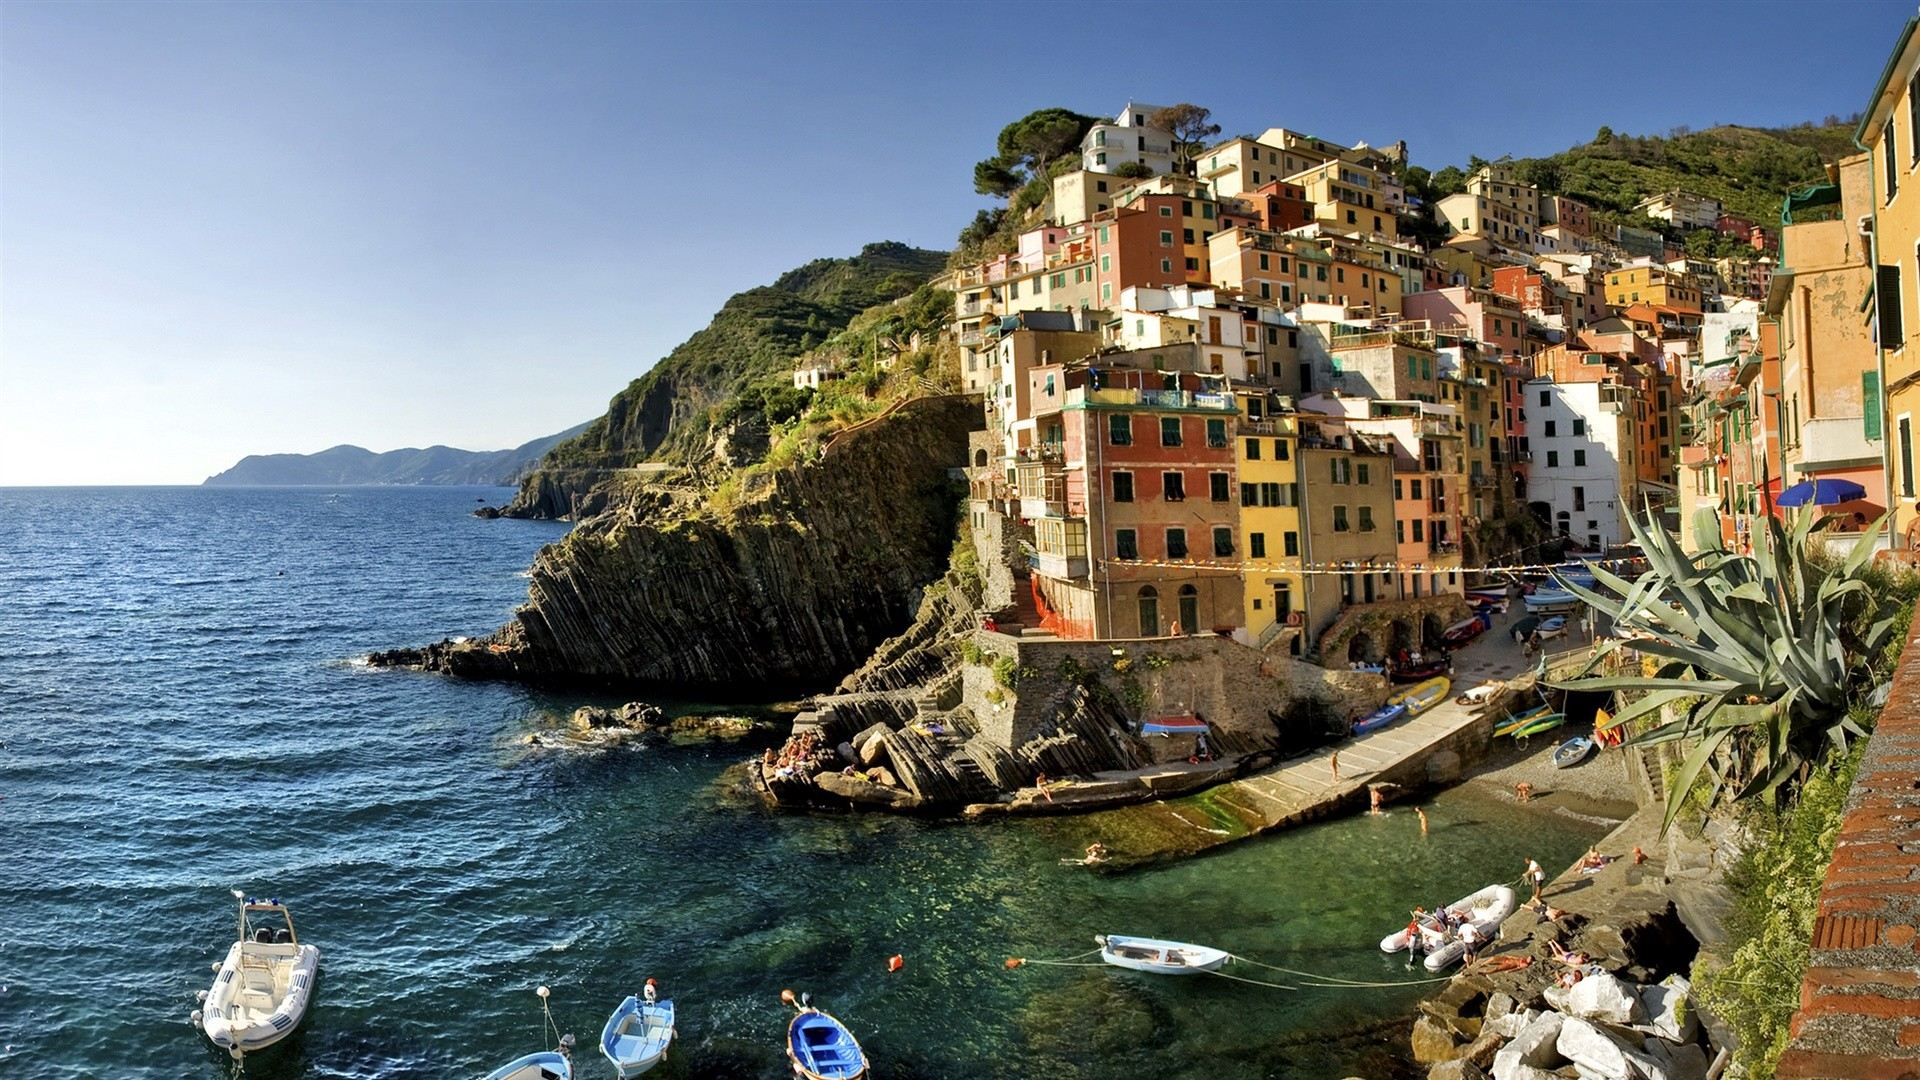 Italy sea wallpaper HD Desktop Wallpaper 1920x1080